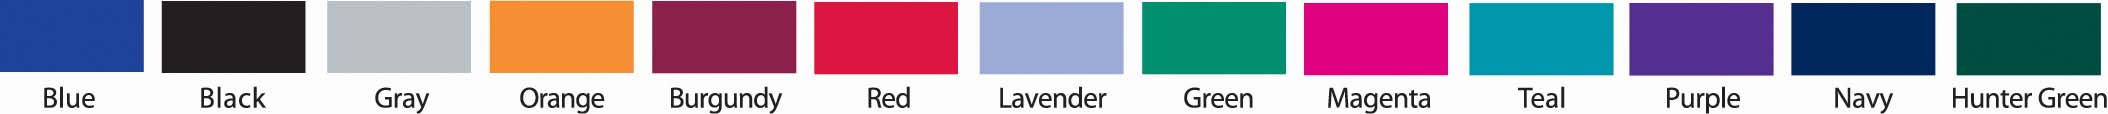 spectrum-dual-head-stethoscope-adult-slider-pack-burgundy-10-429-070-lr-2.jpg